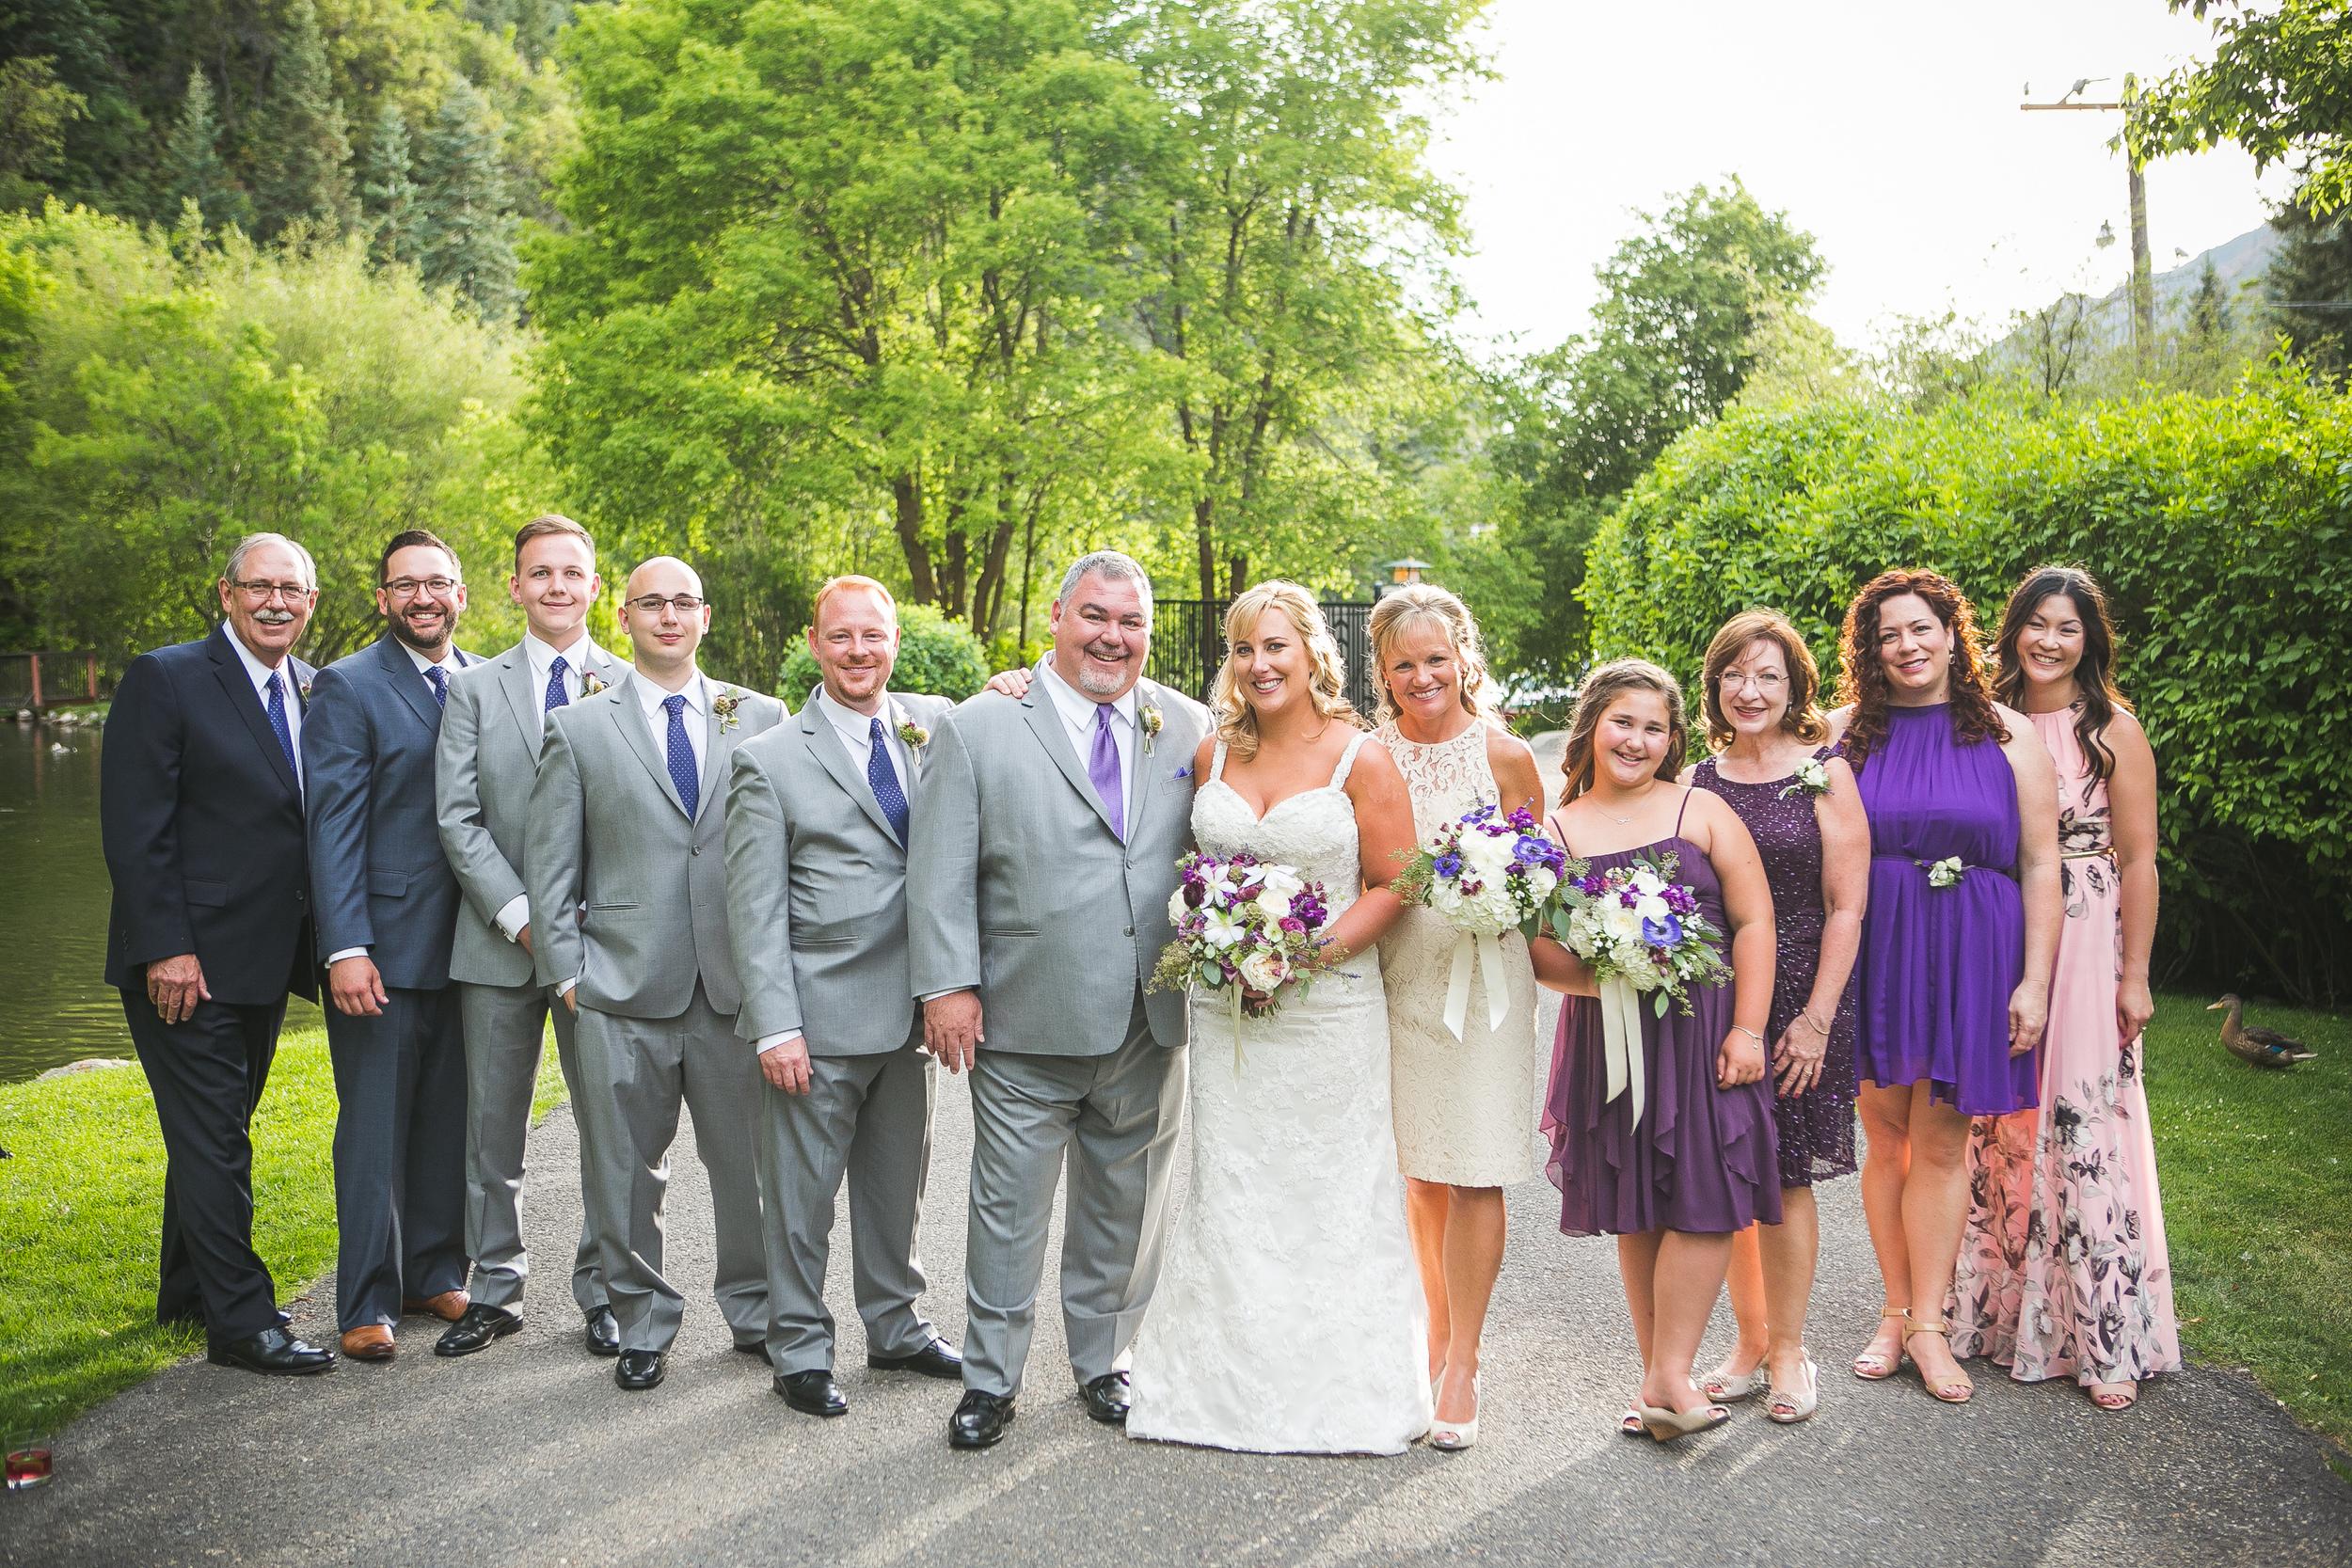 Log Haven Wedding   Mountain Wedding   Michelle Leo Events   Utah Event Planner and Designer   Chad Braithwaite Faces Photography